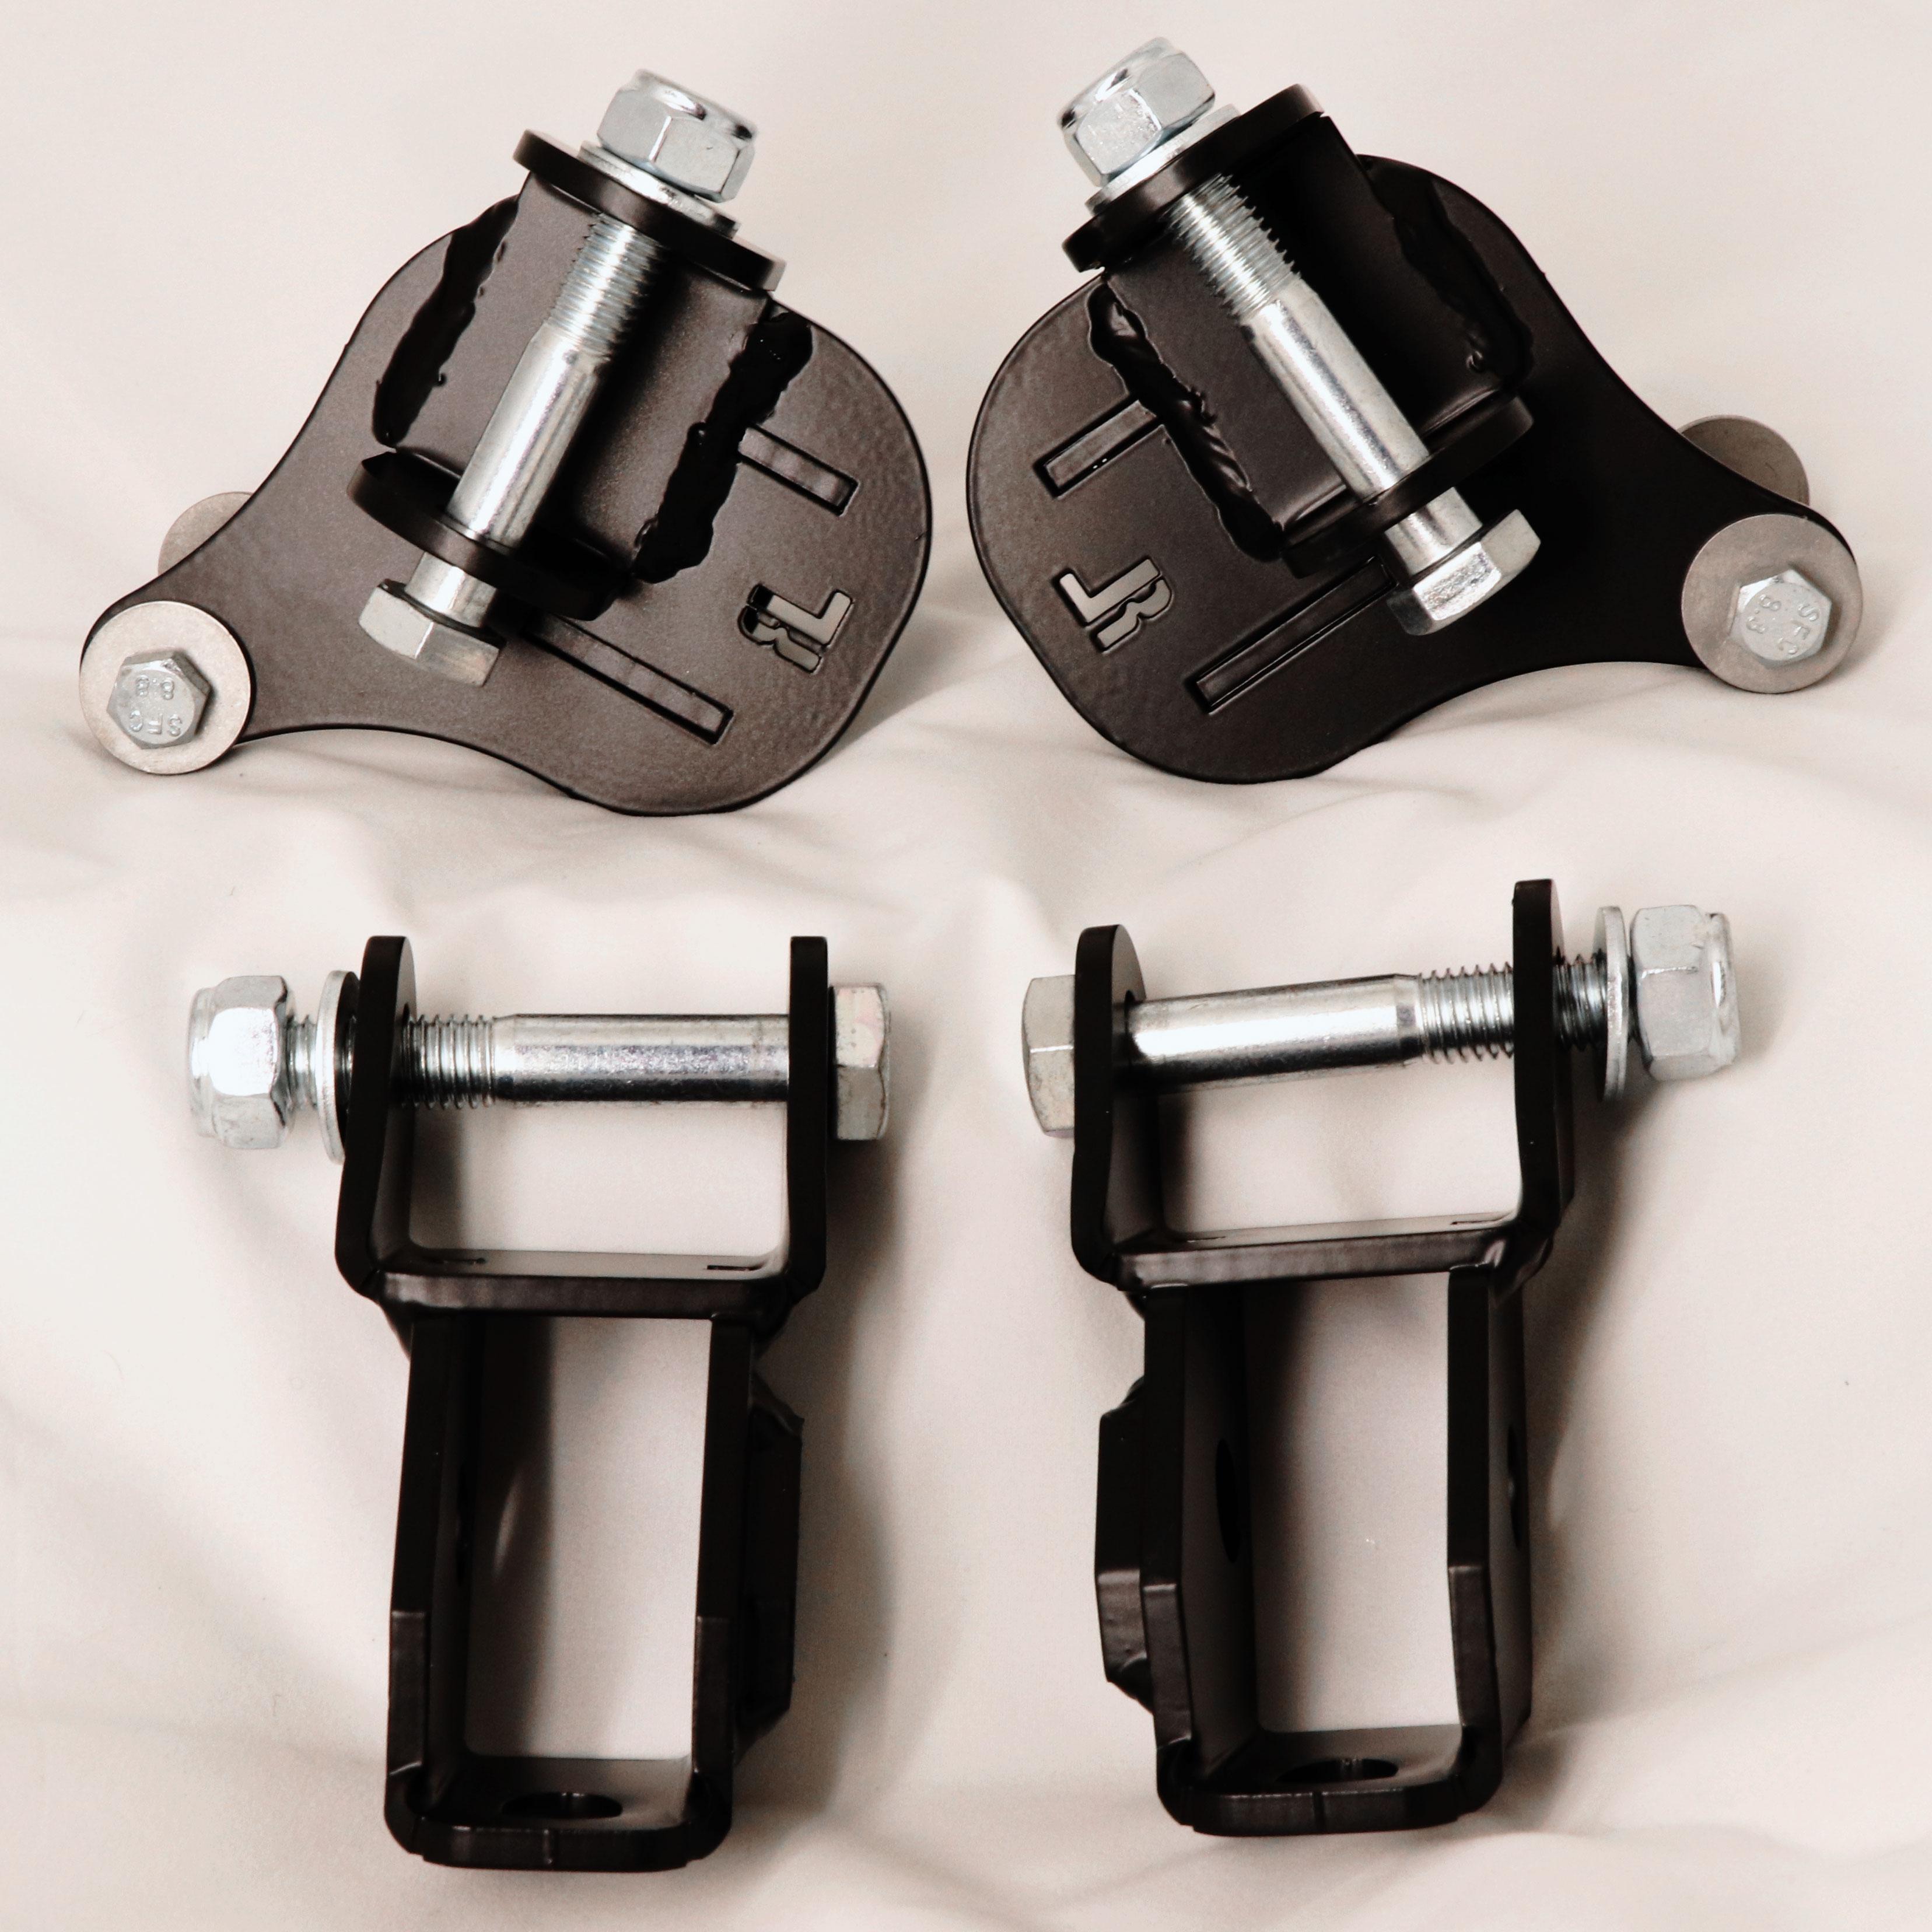 3 Lift Kit >> Exomotive Us Manufacturer Of Exocars Kit Cars Exocet 3 Lift Kit